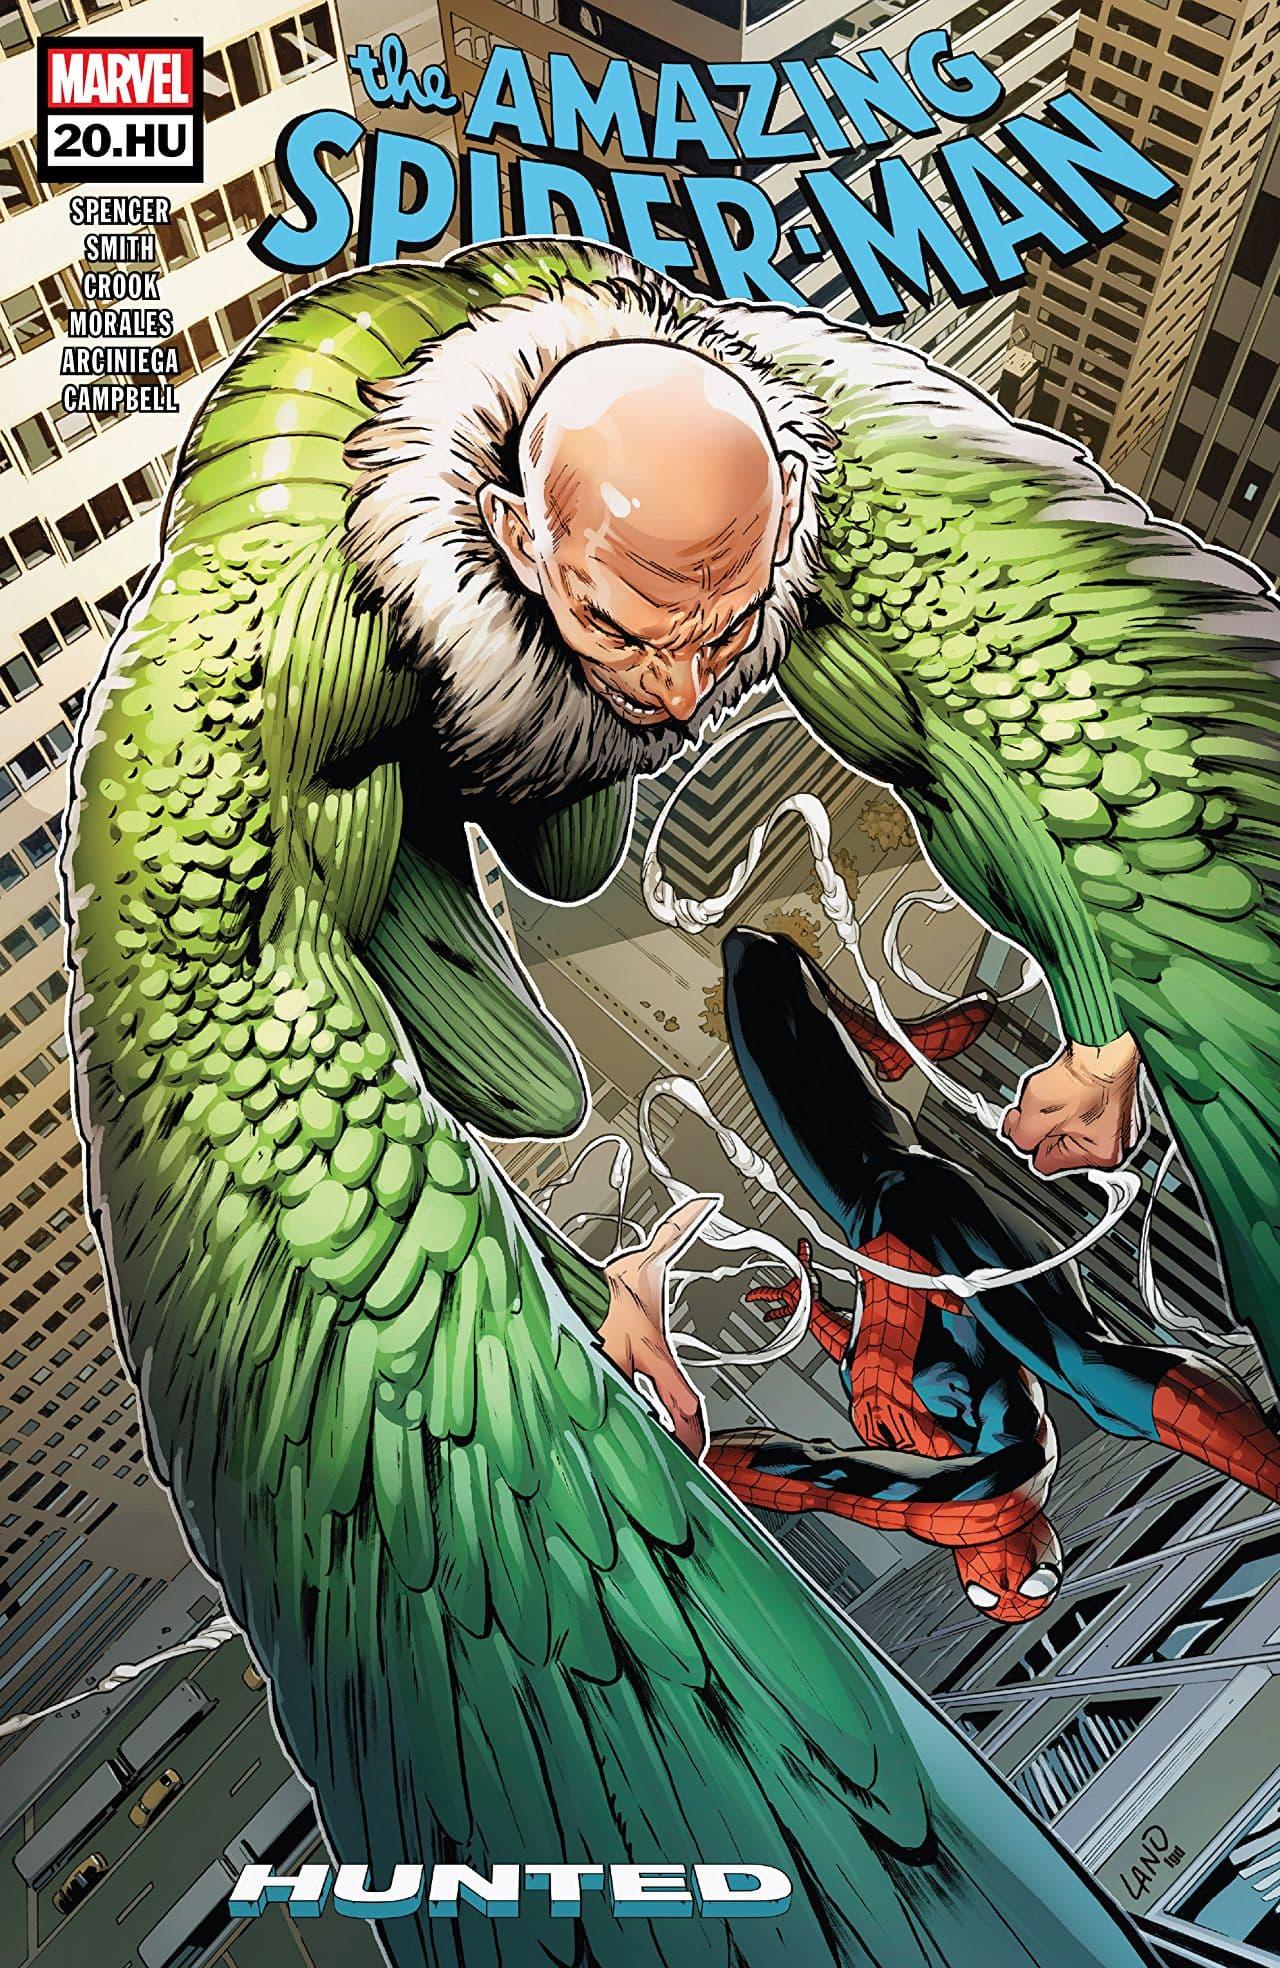 Amazing Spider-Man (2018-) #20.HU